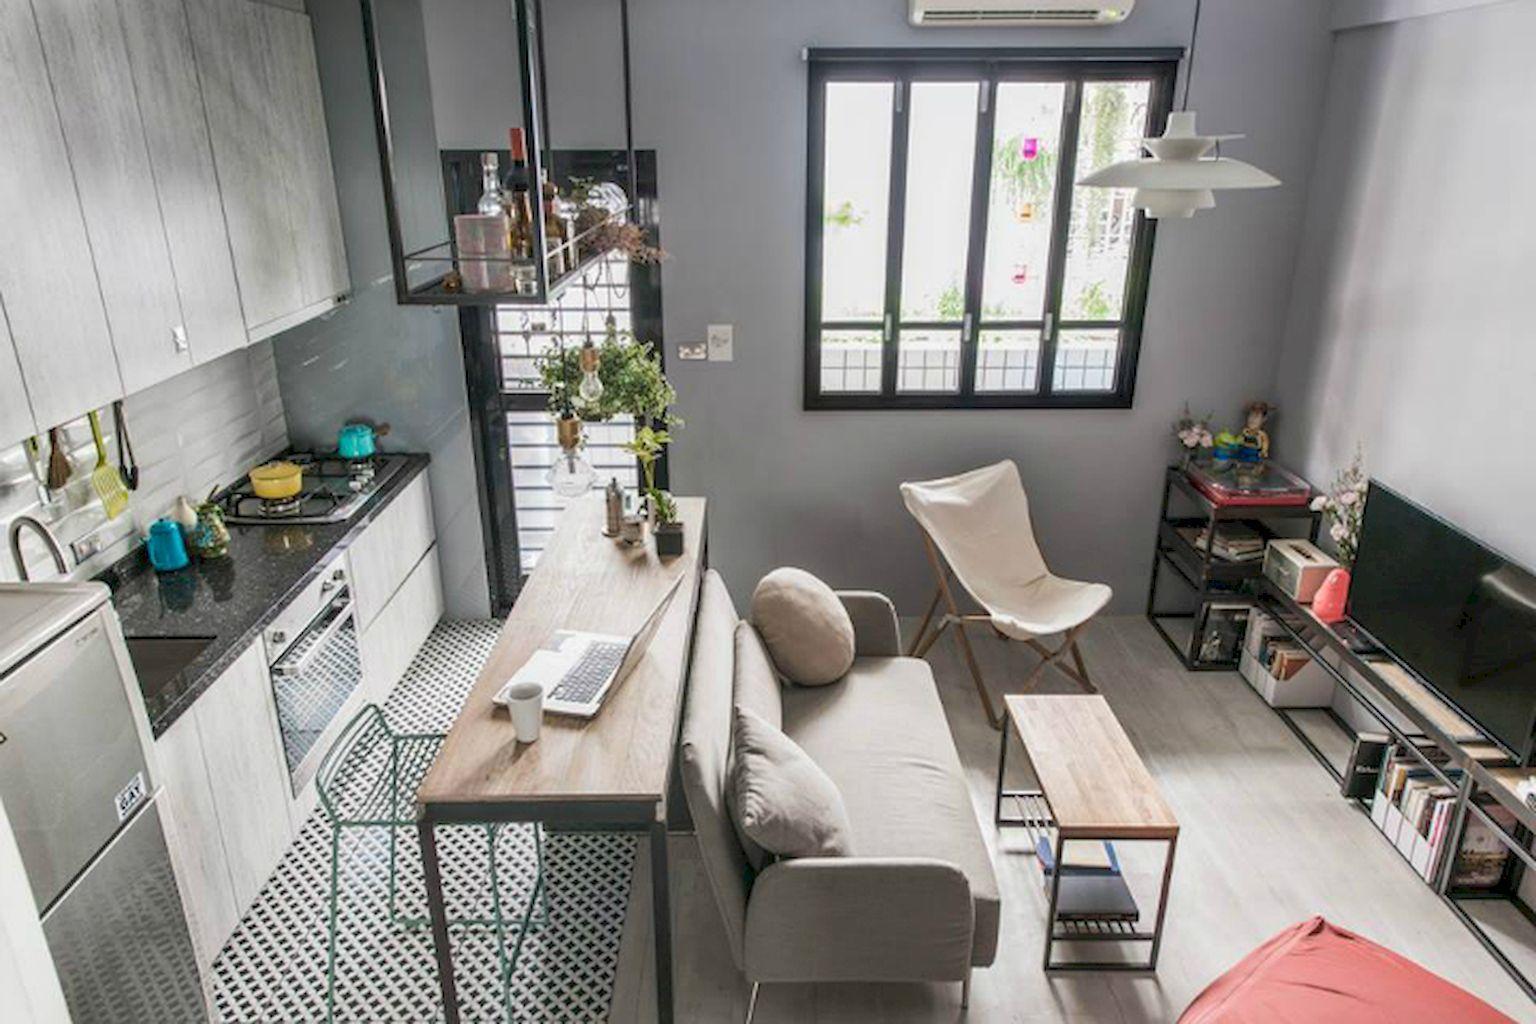 Gorgeous 33 Stylish And Cute Apartment Studio Decor Ideas Https Livinki Small Apartment Living Room Small Apartment Kitchen Decor Apartment Decorating Rental